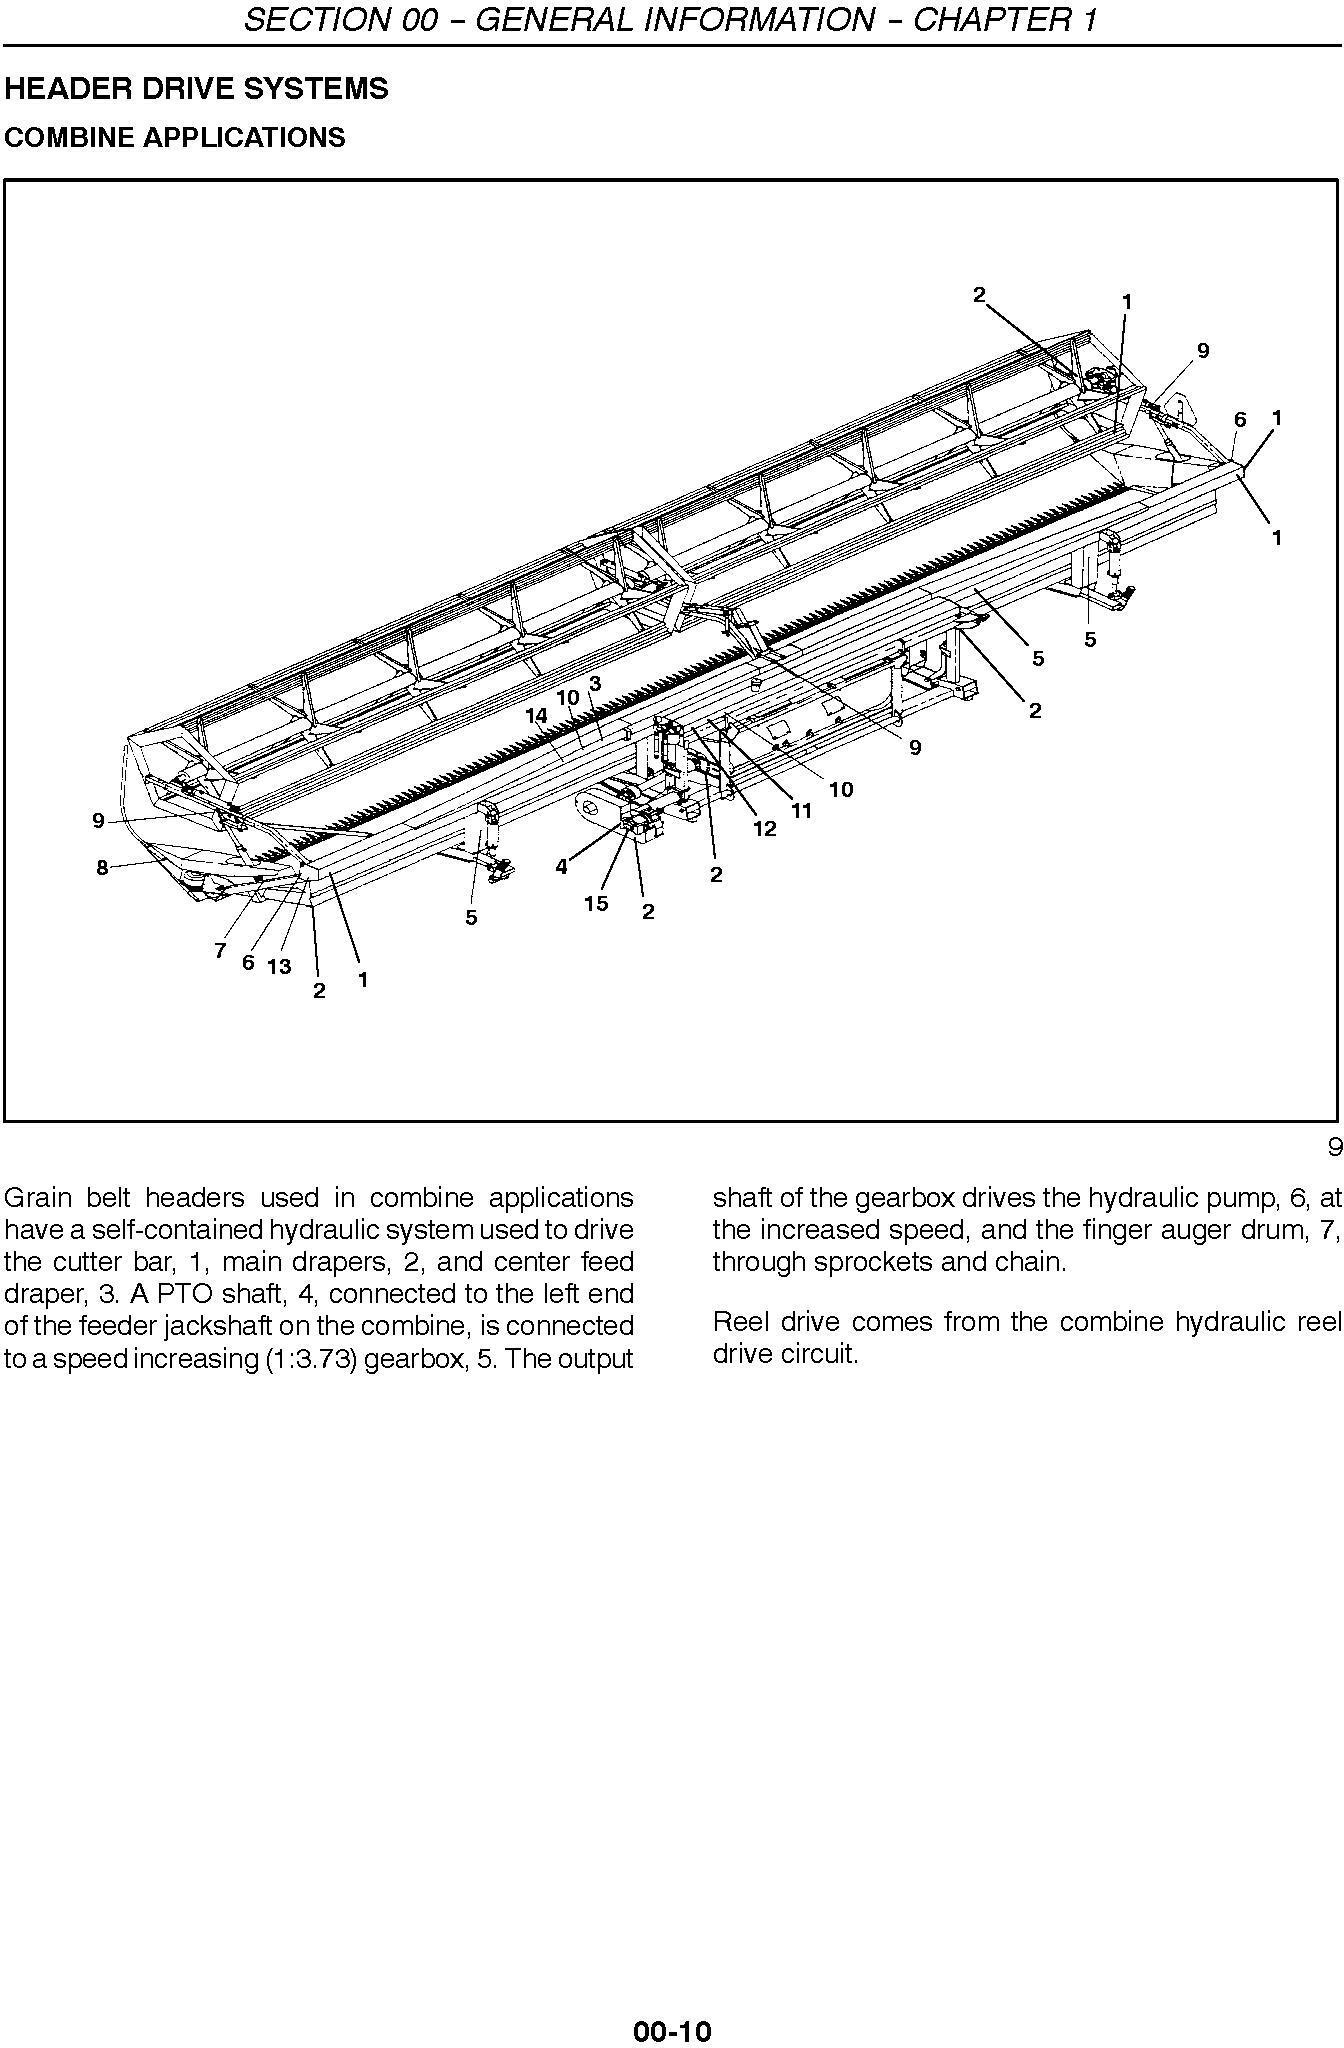 New Holland 994, 92c, 94c Grain Belt Headers Service Manual - 1